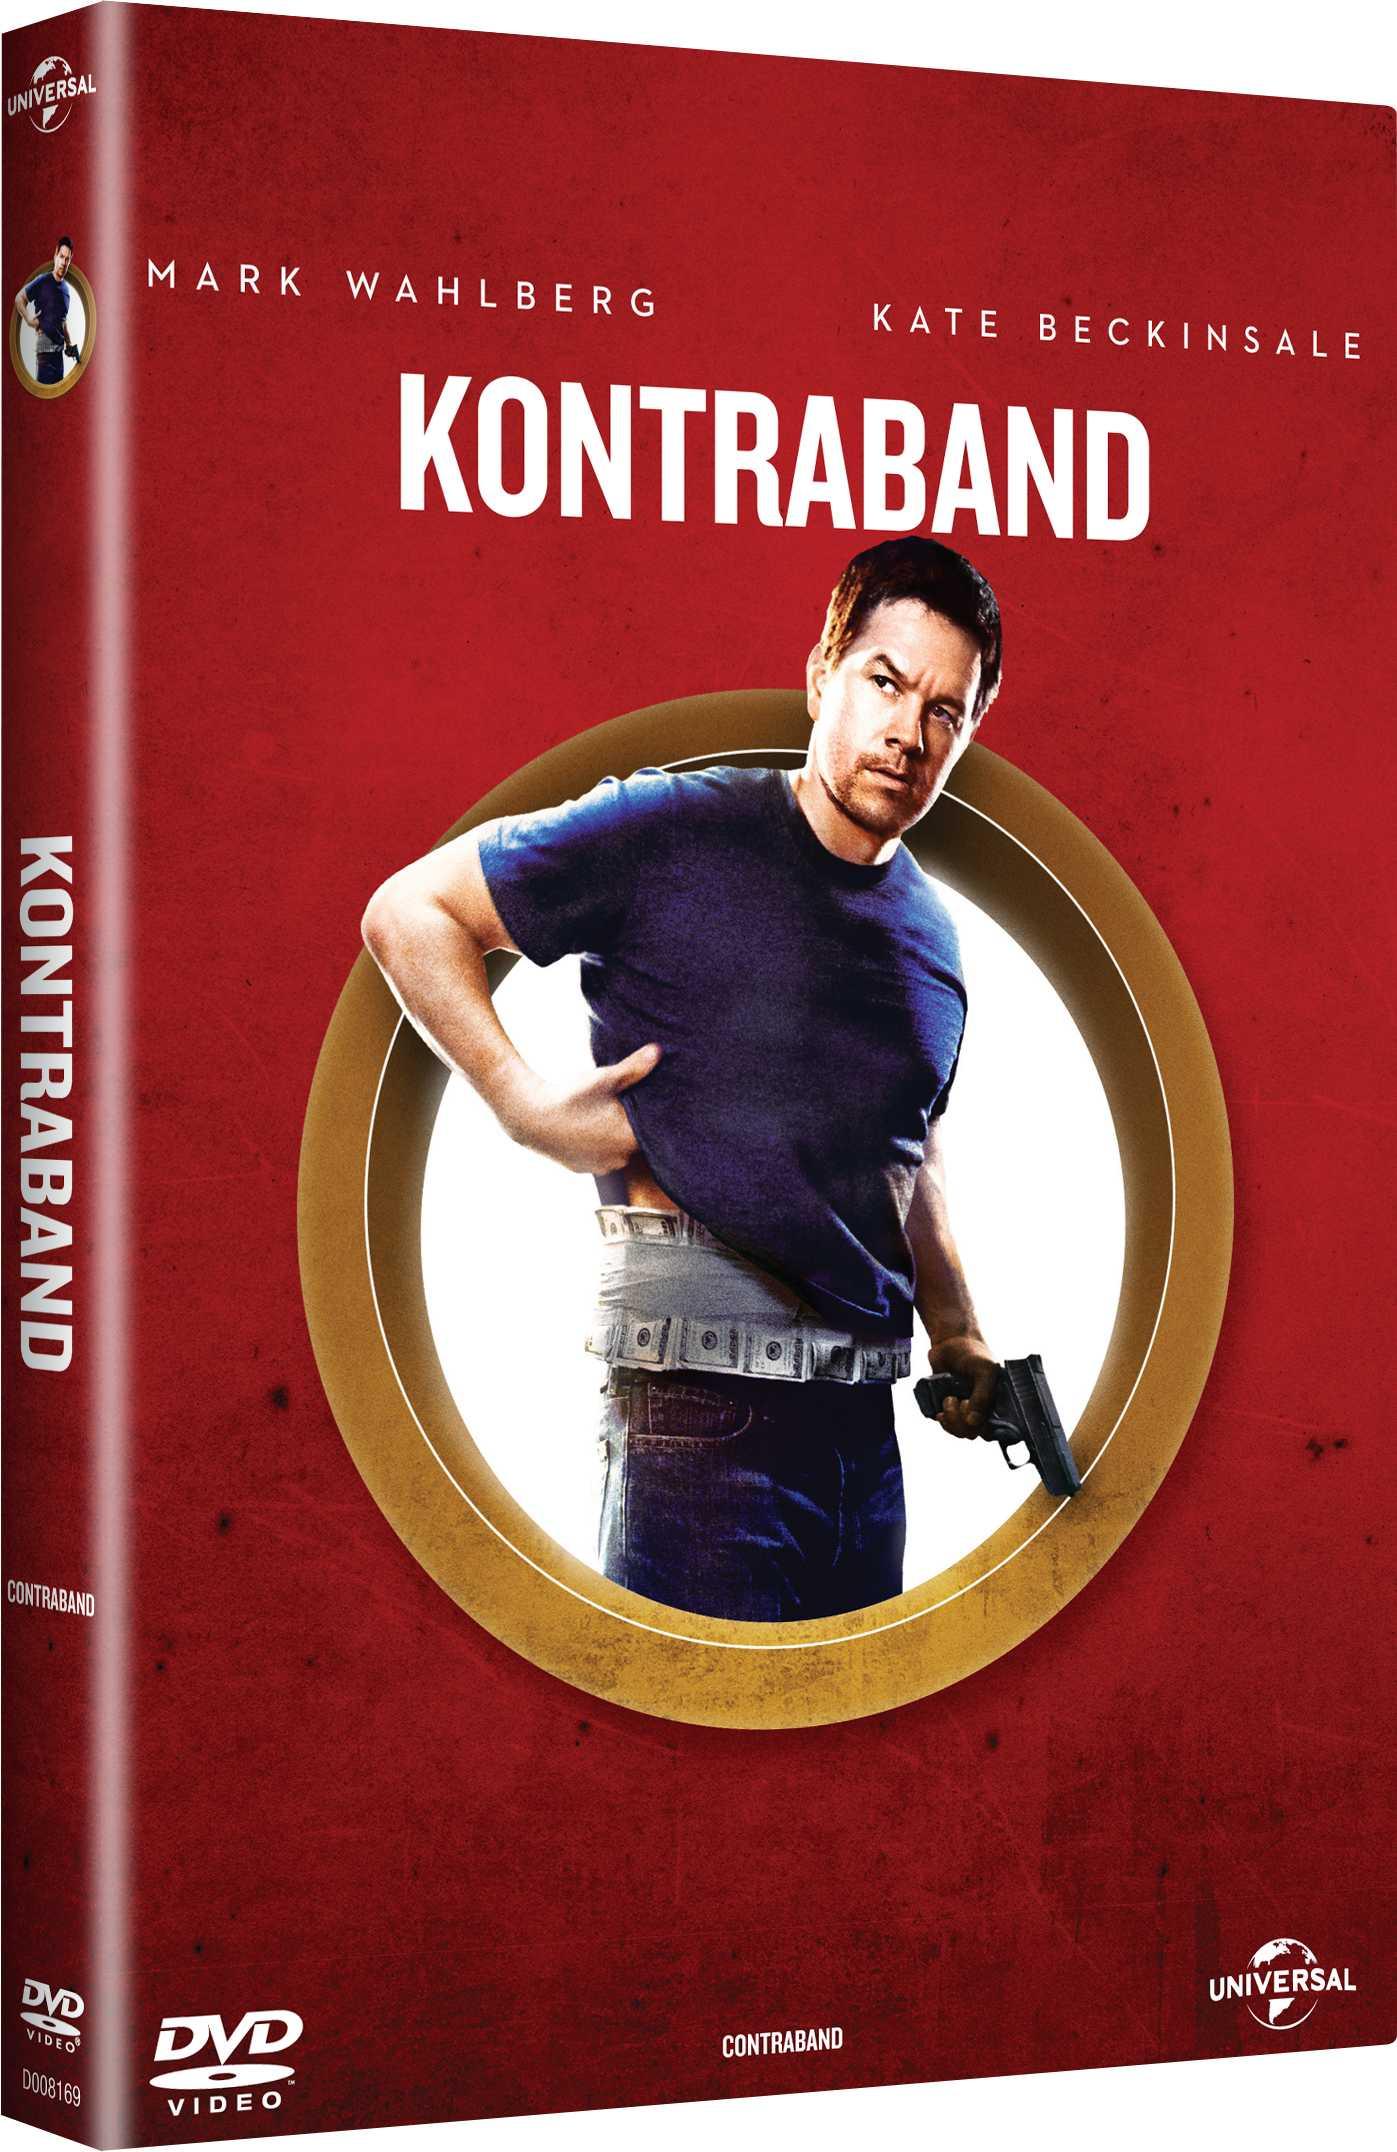 Kontraband (Unbelievable Entertainment) - DVD